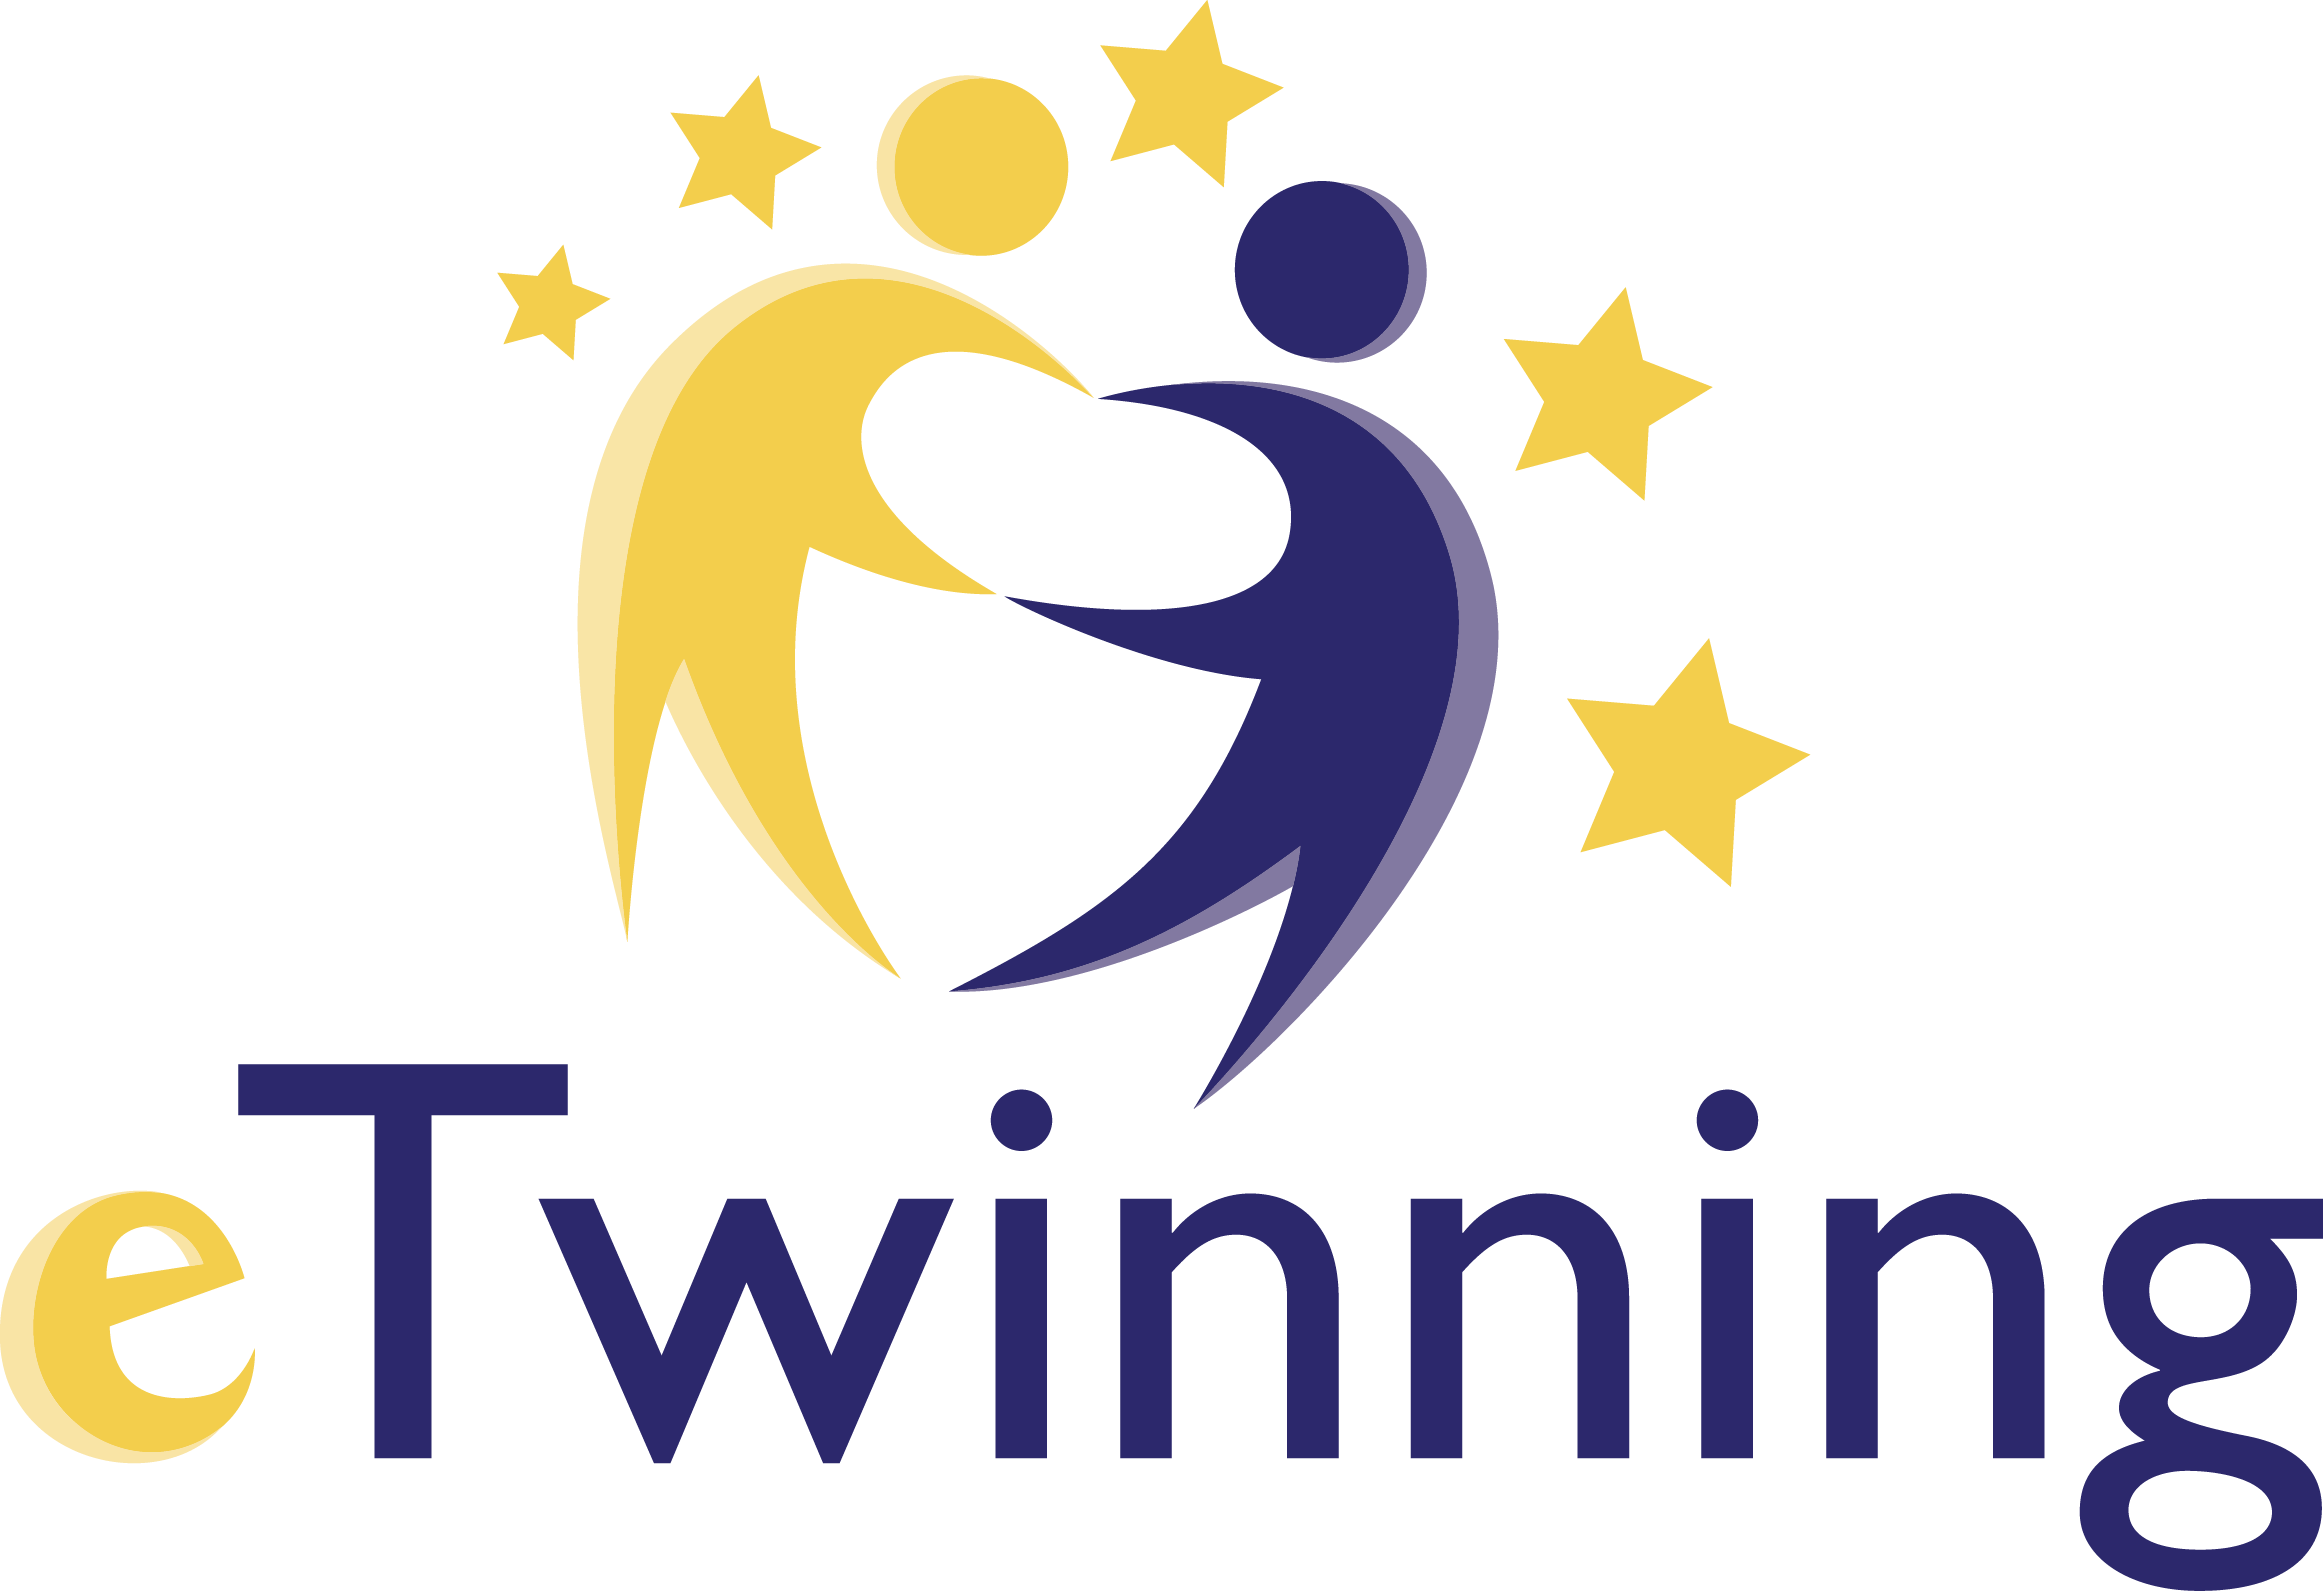 logotip eTwinning